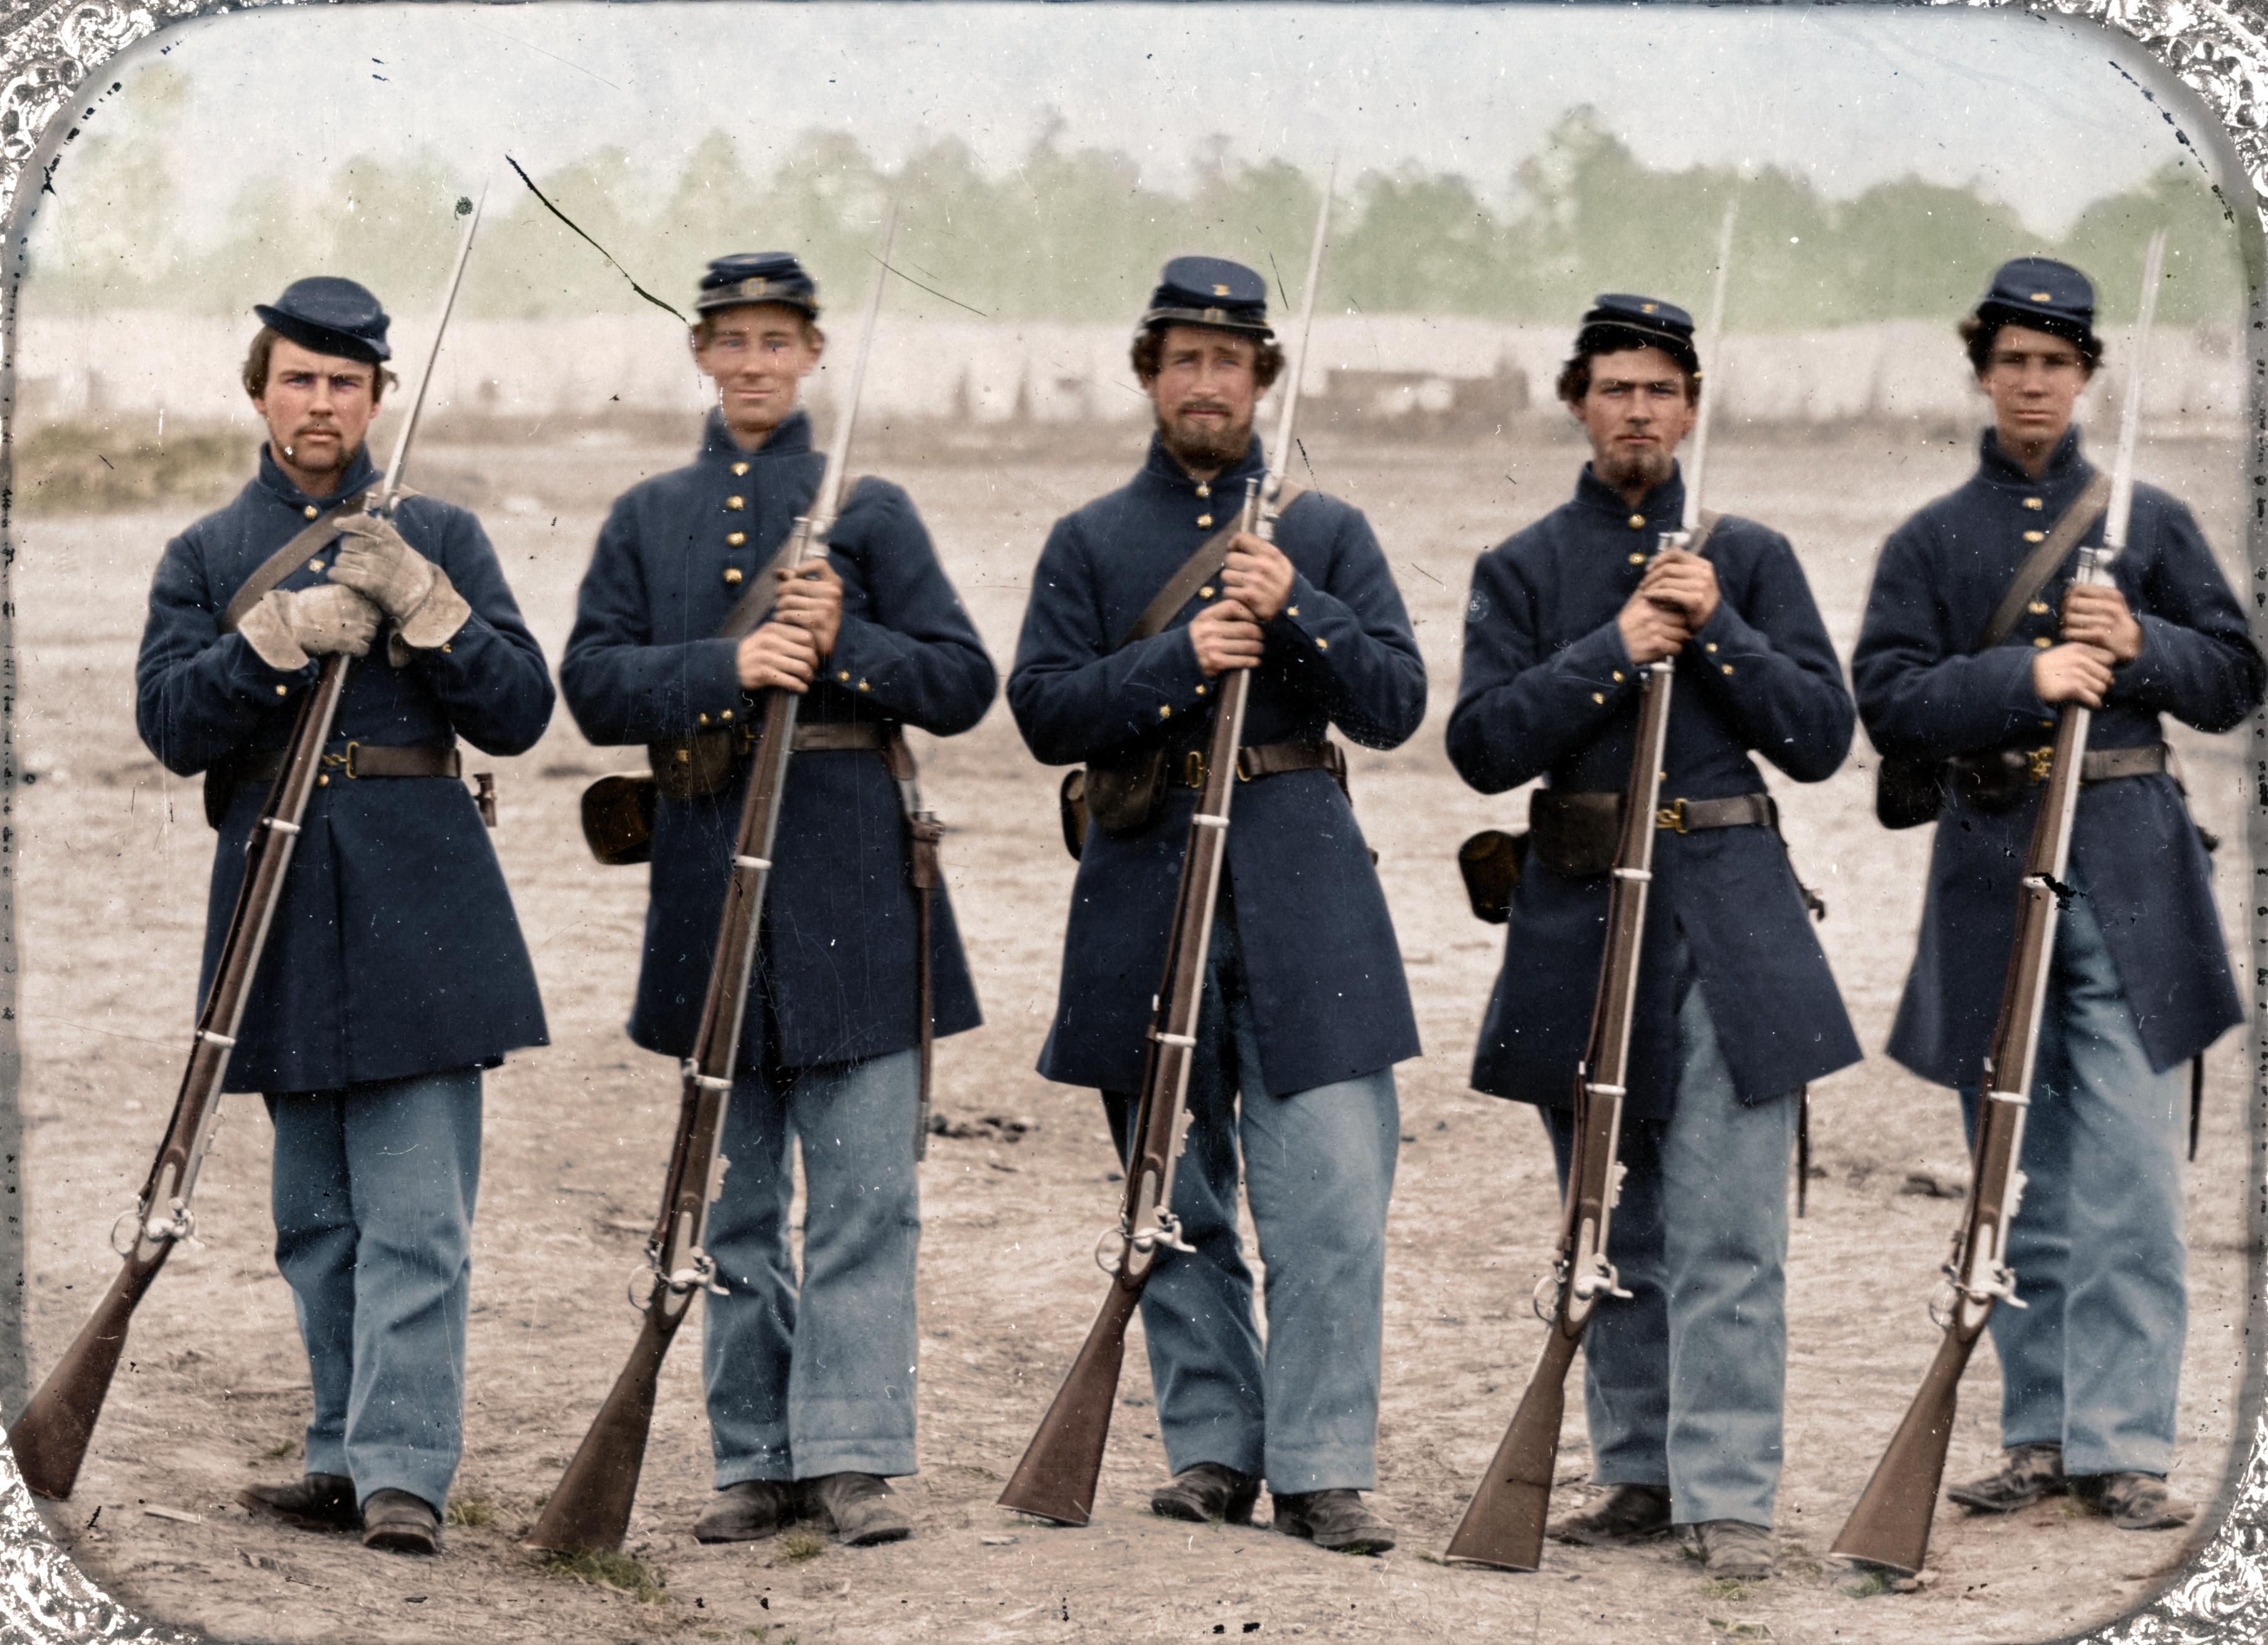 The Confederates Uniform - Boobs And Cock